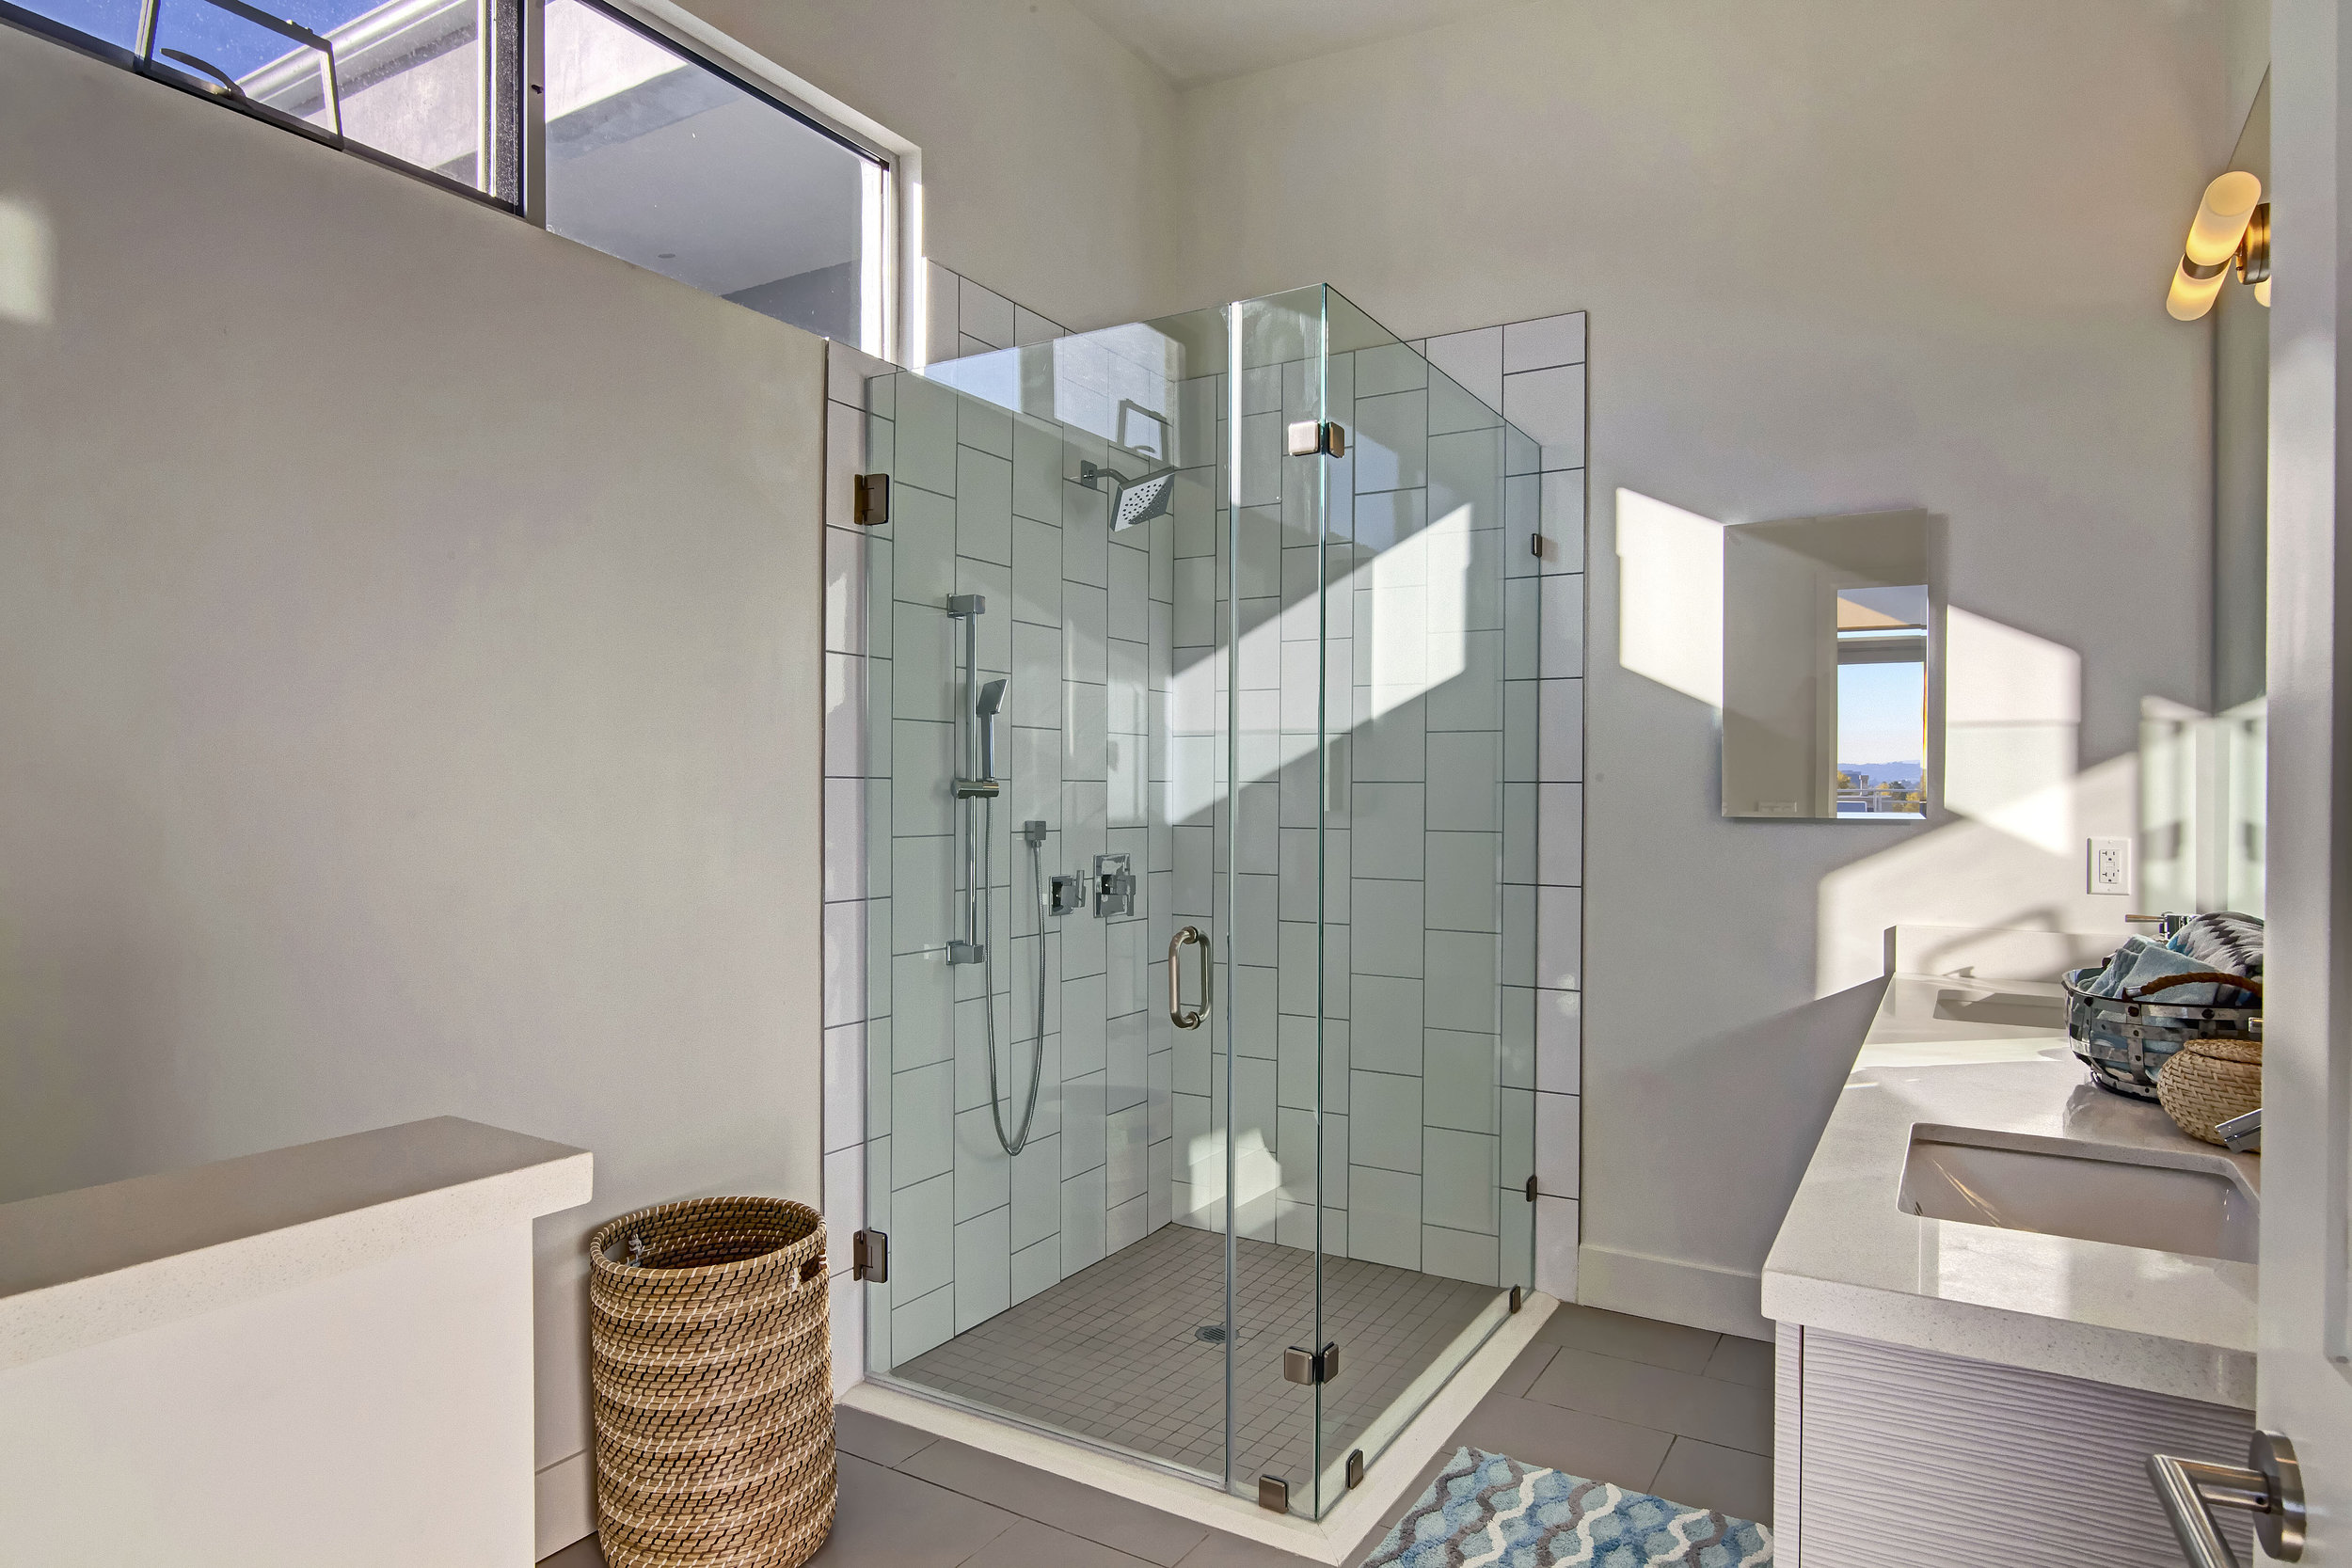 West Master Bathroom.jpg